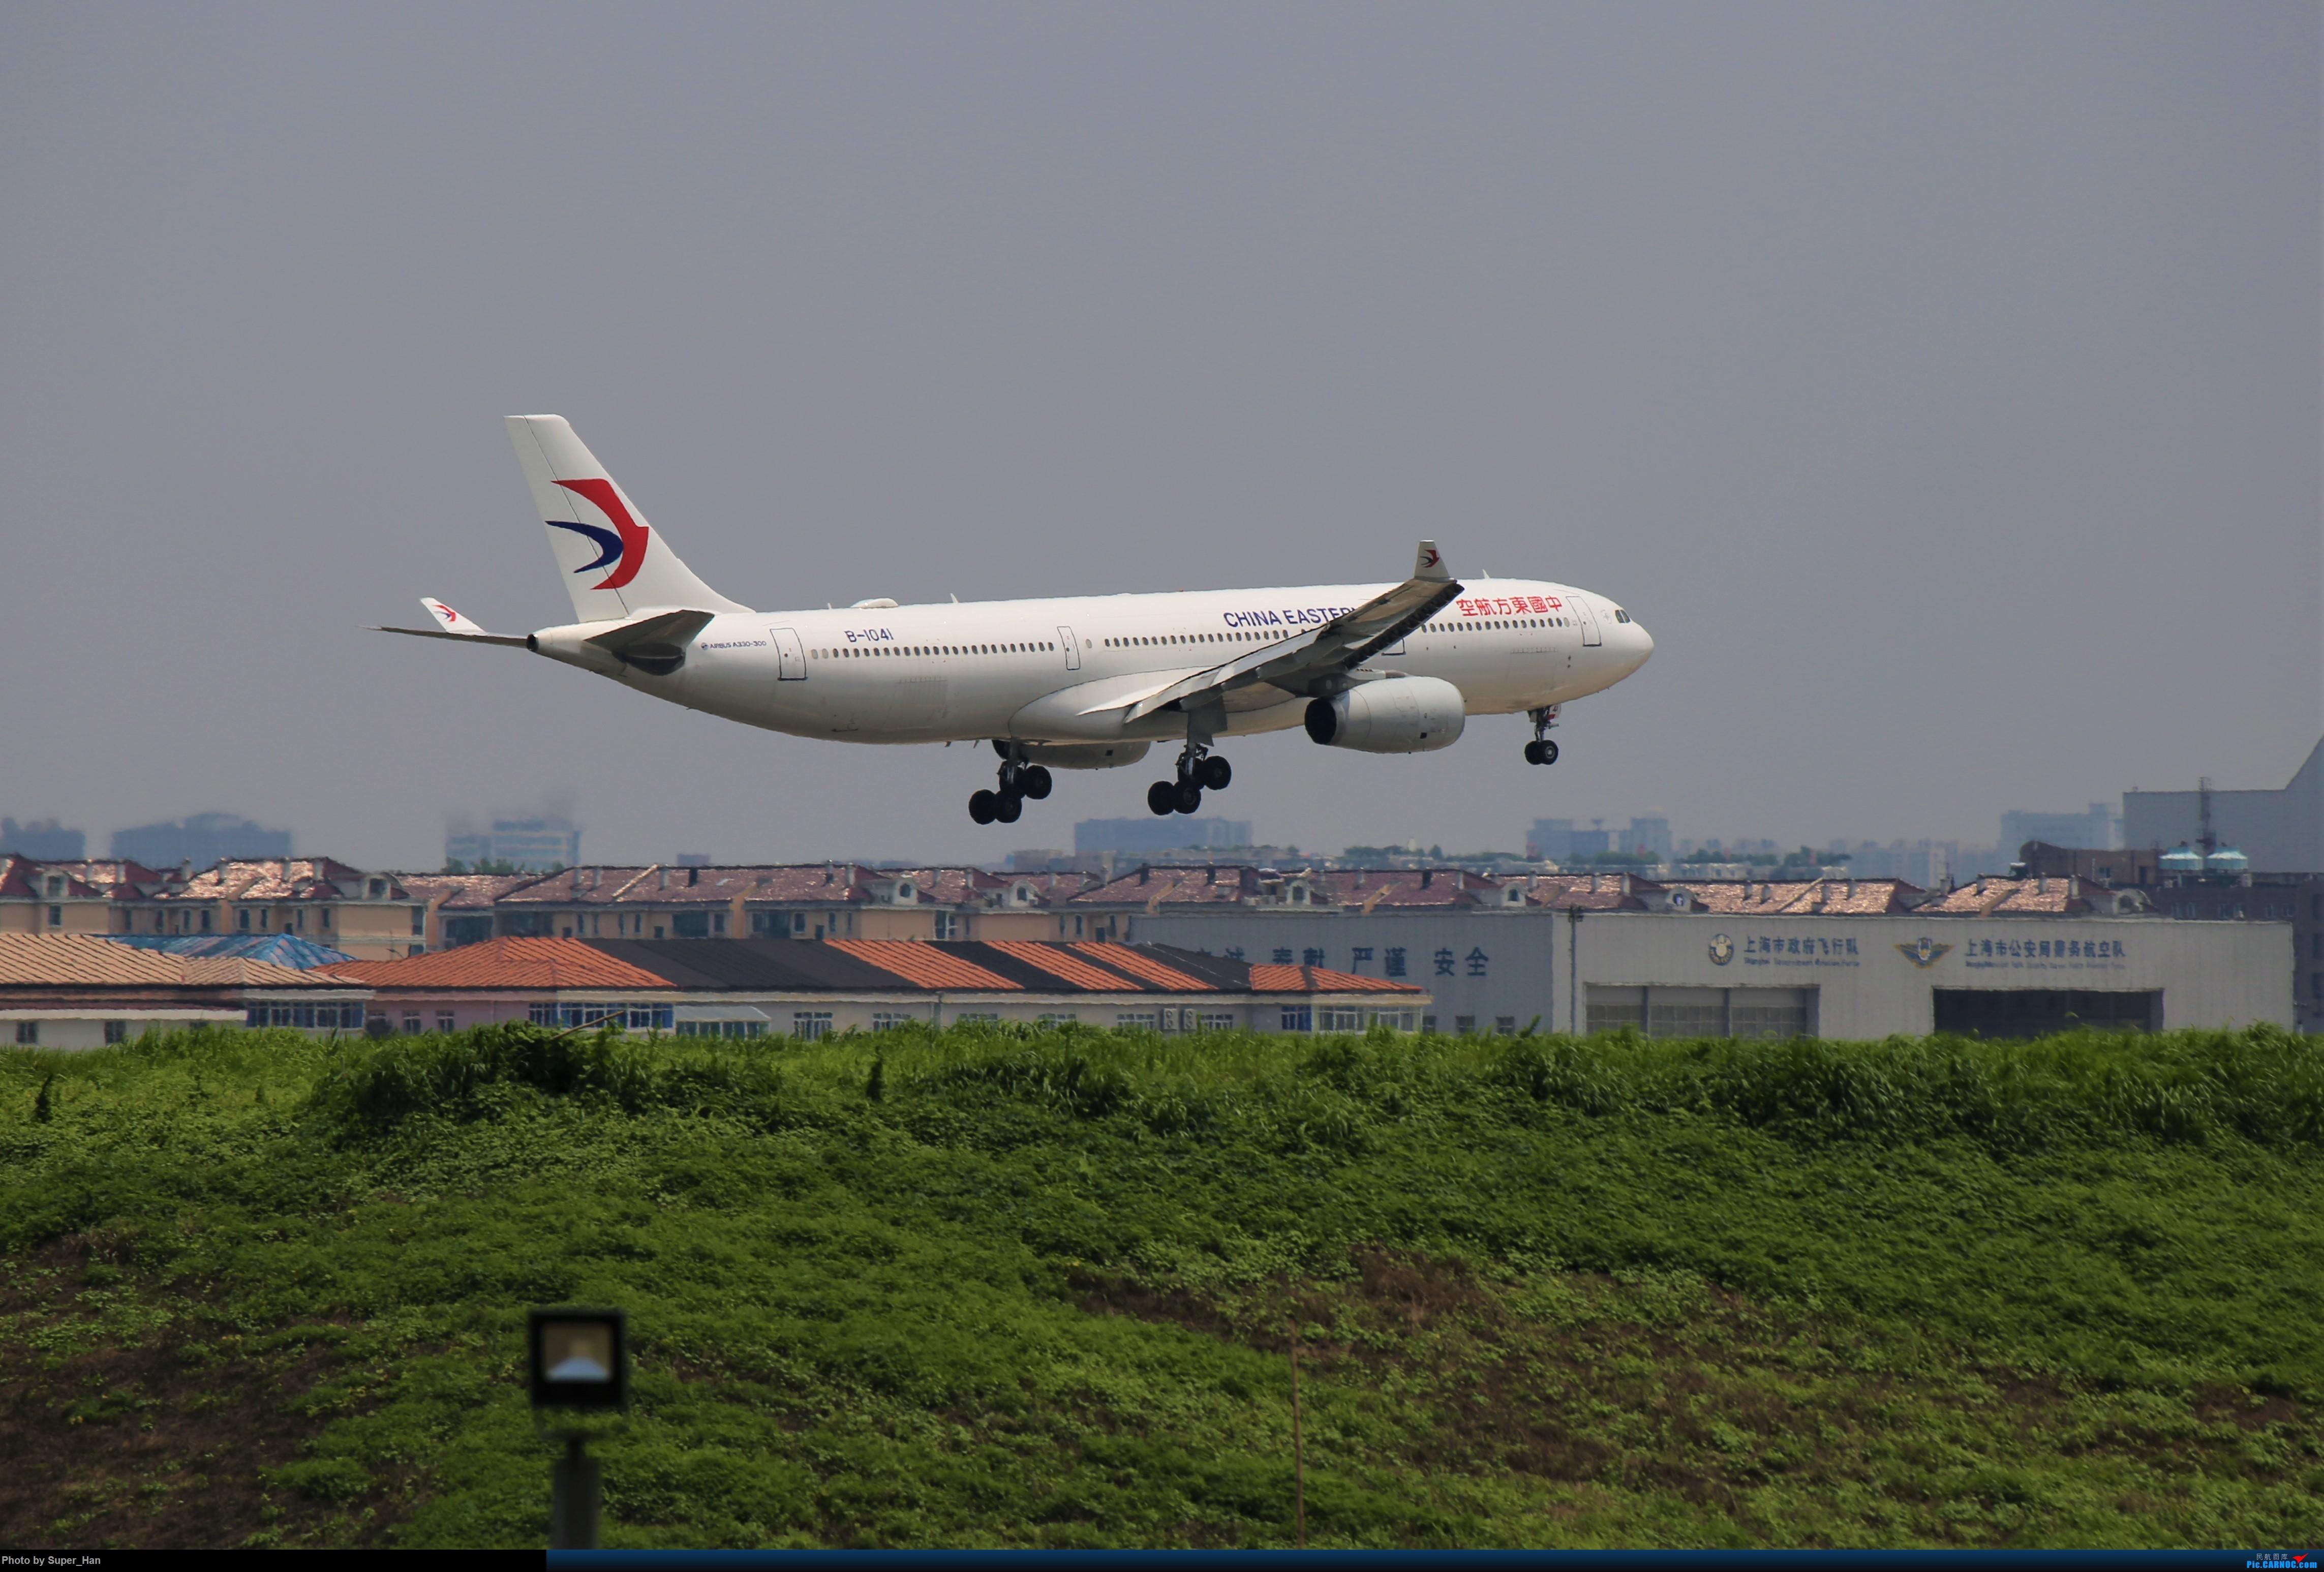 Re:[原创]0715去虹桥说走就走【最多的330篇】 AIRBUS A330-300 B-1041 中国上海虹桥国际机场